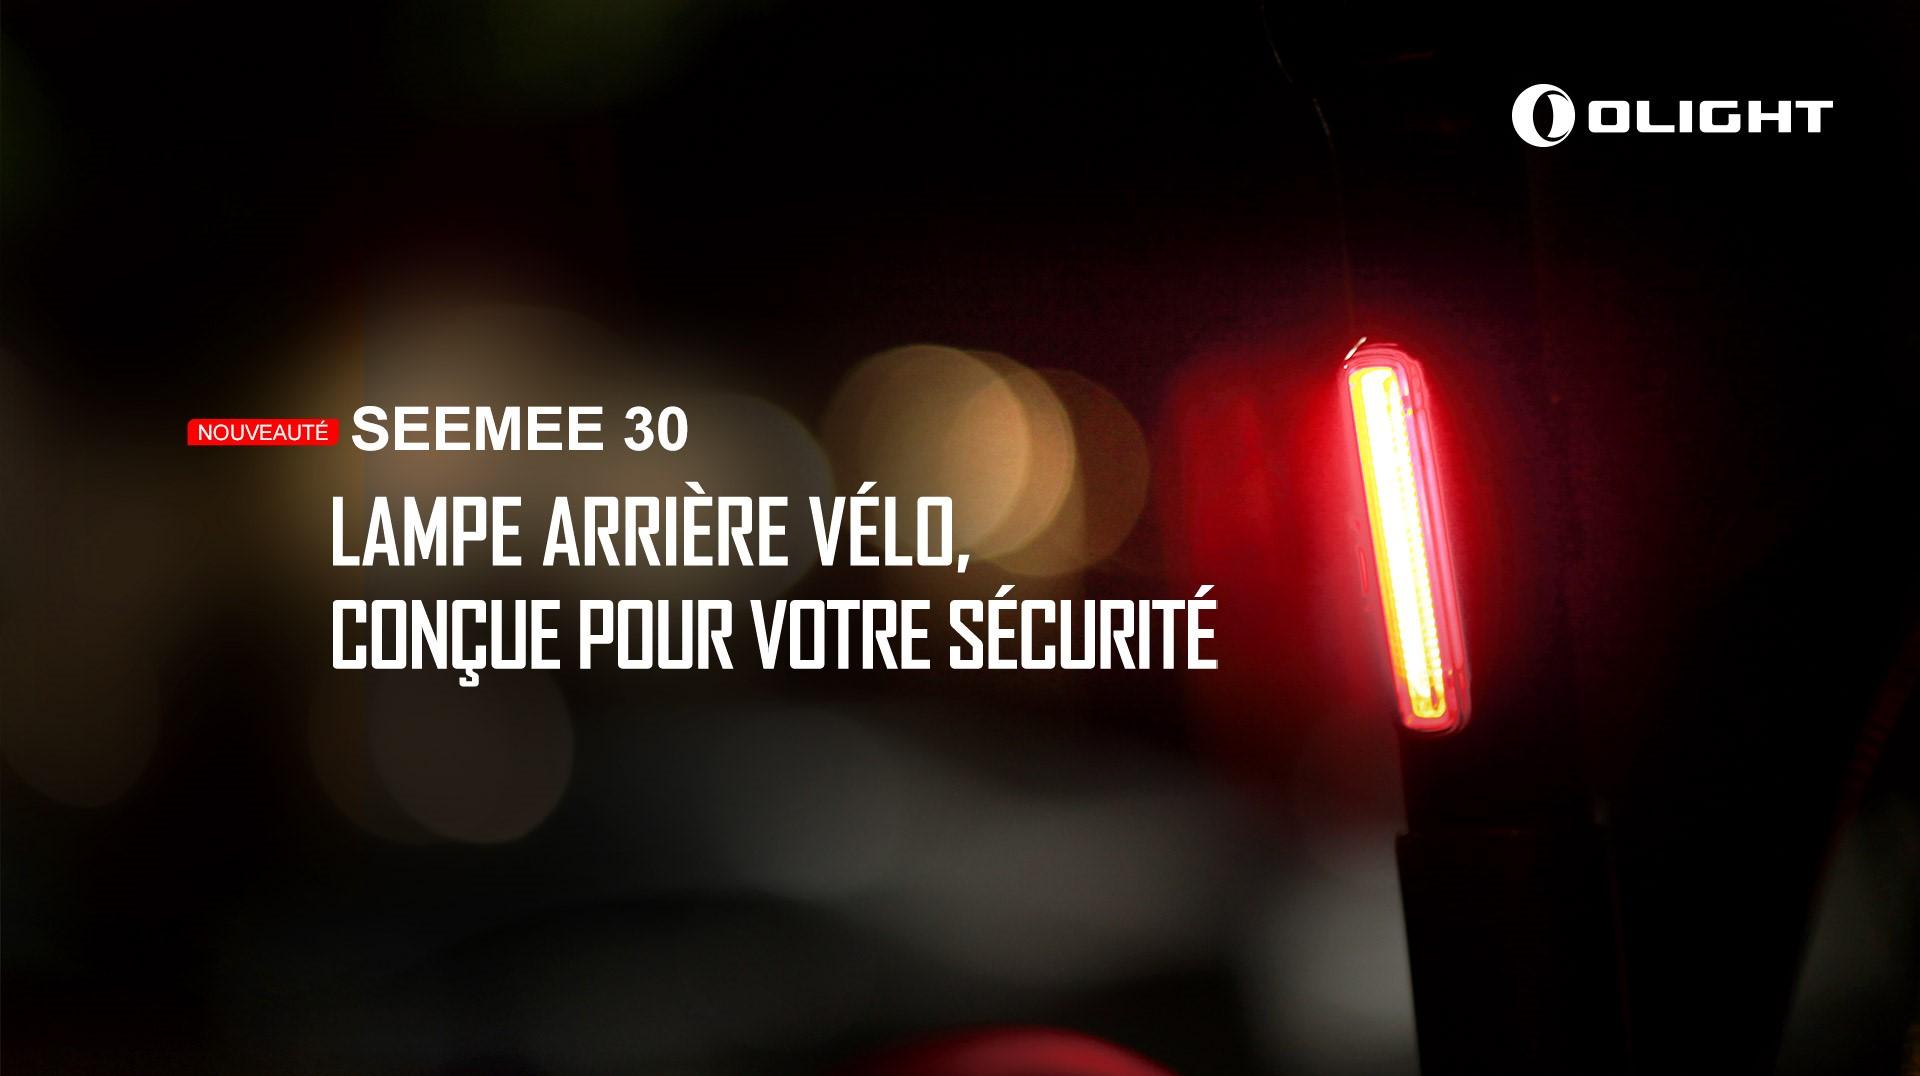 Seemee 30 TL lampe arrière vélo rechargeable